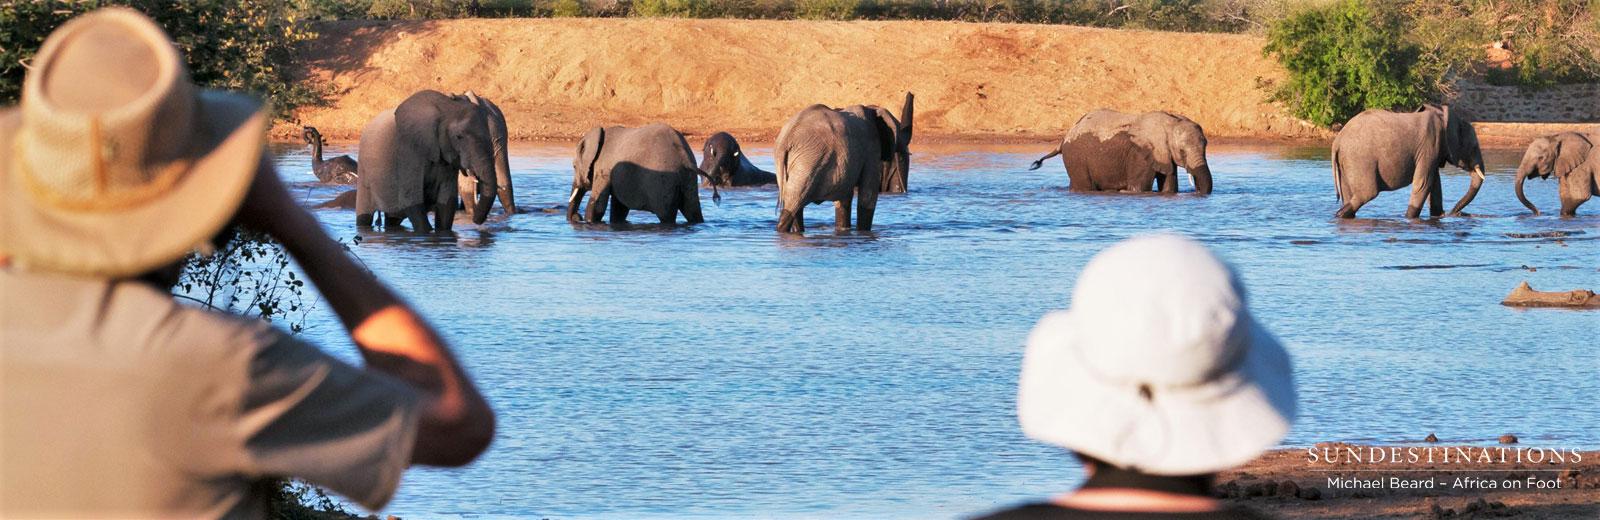 Elephants at Dam